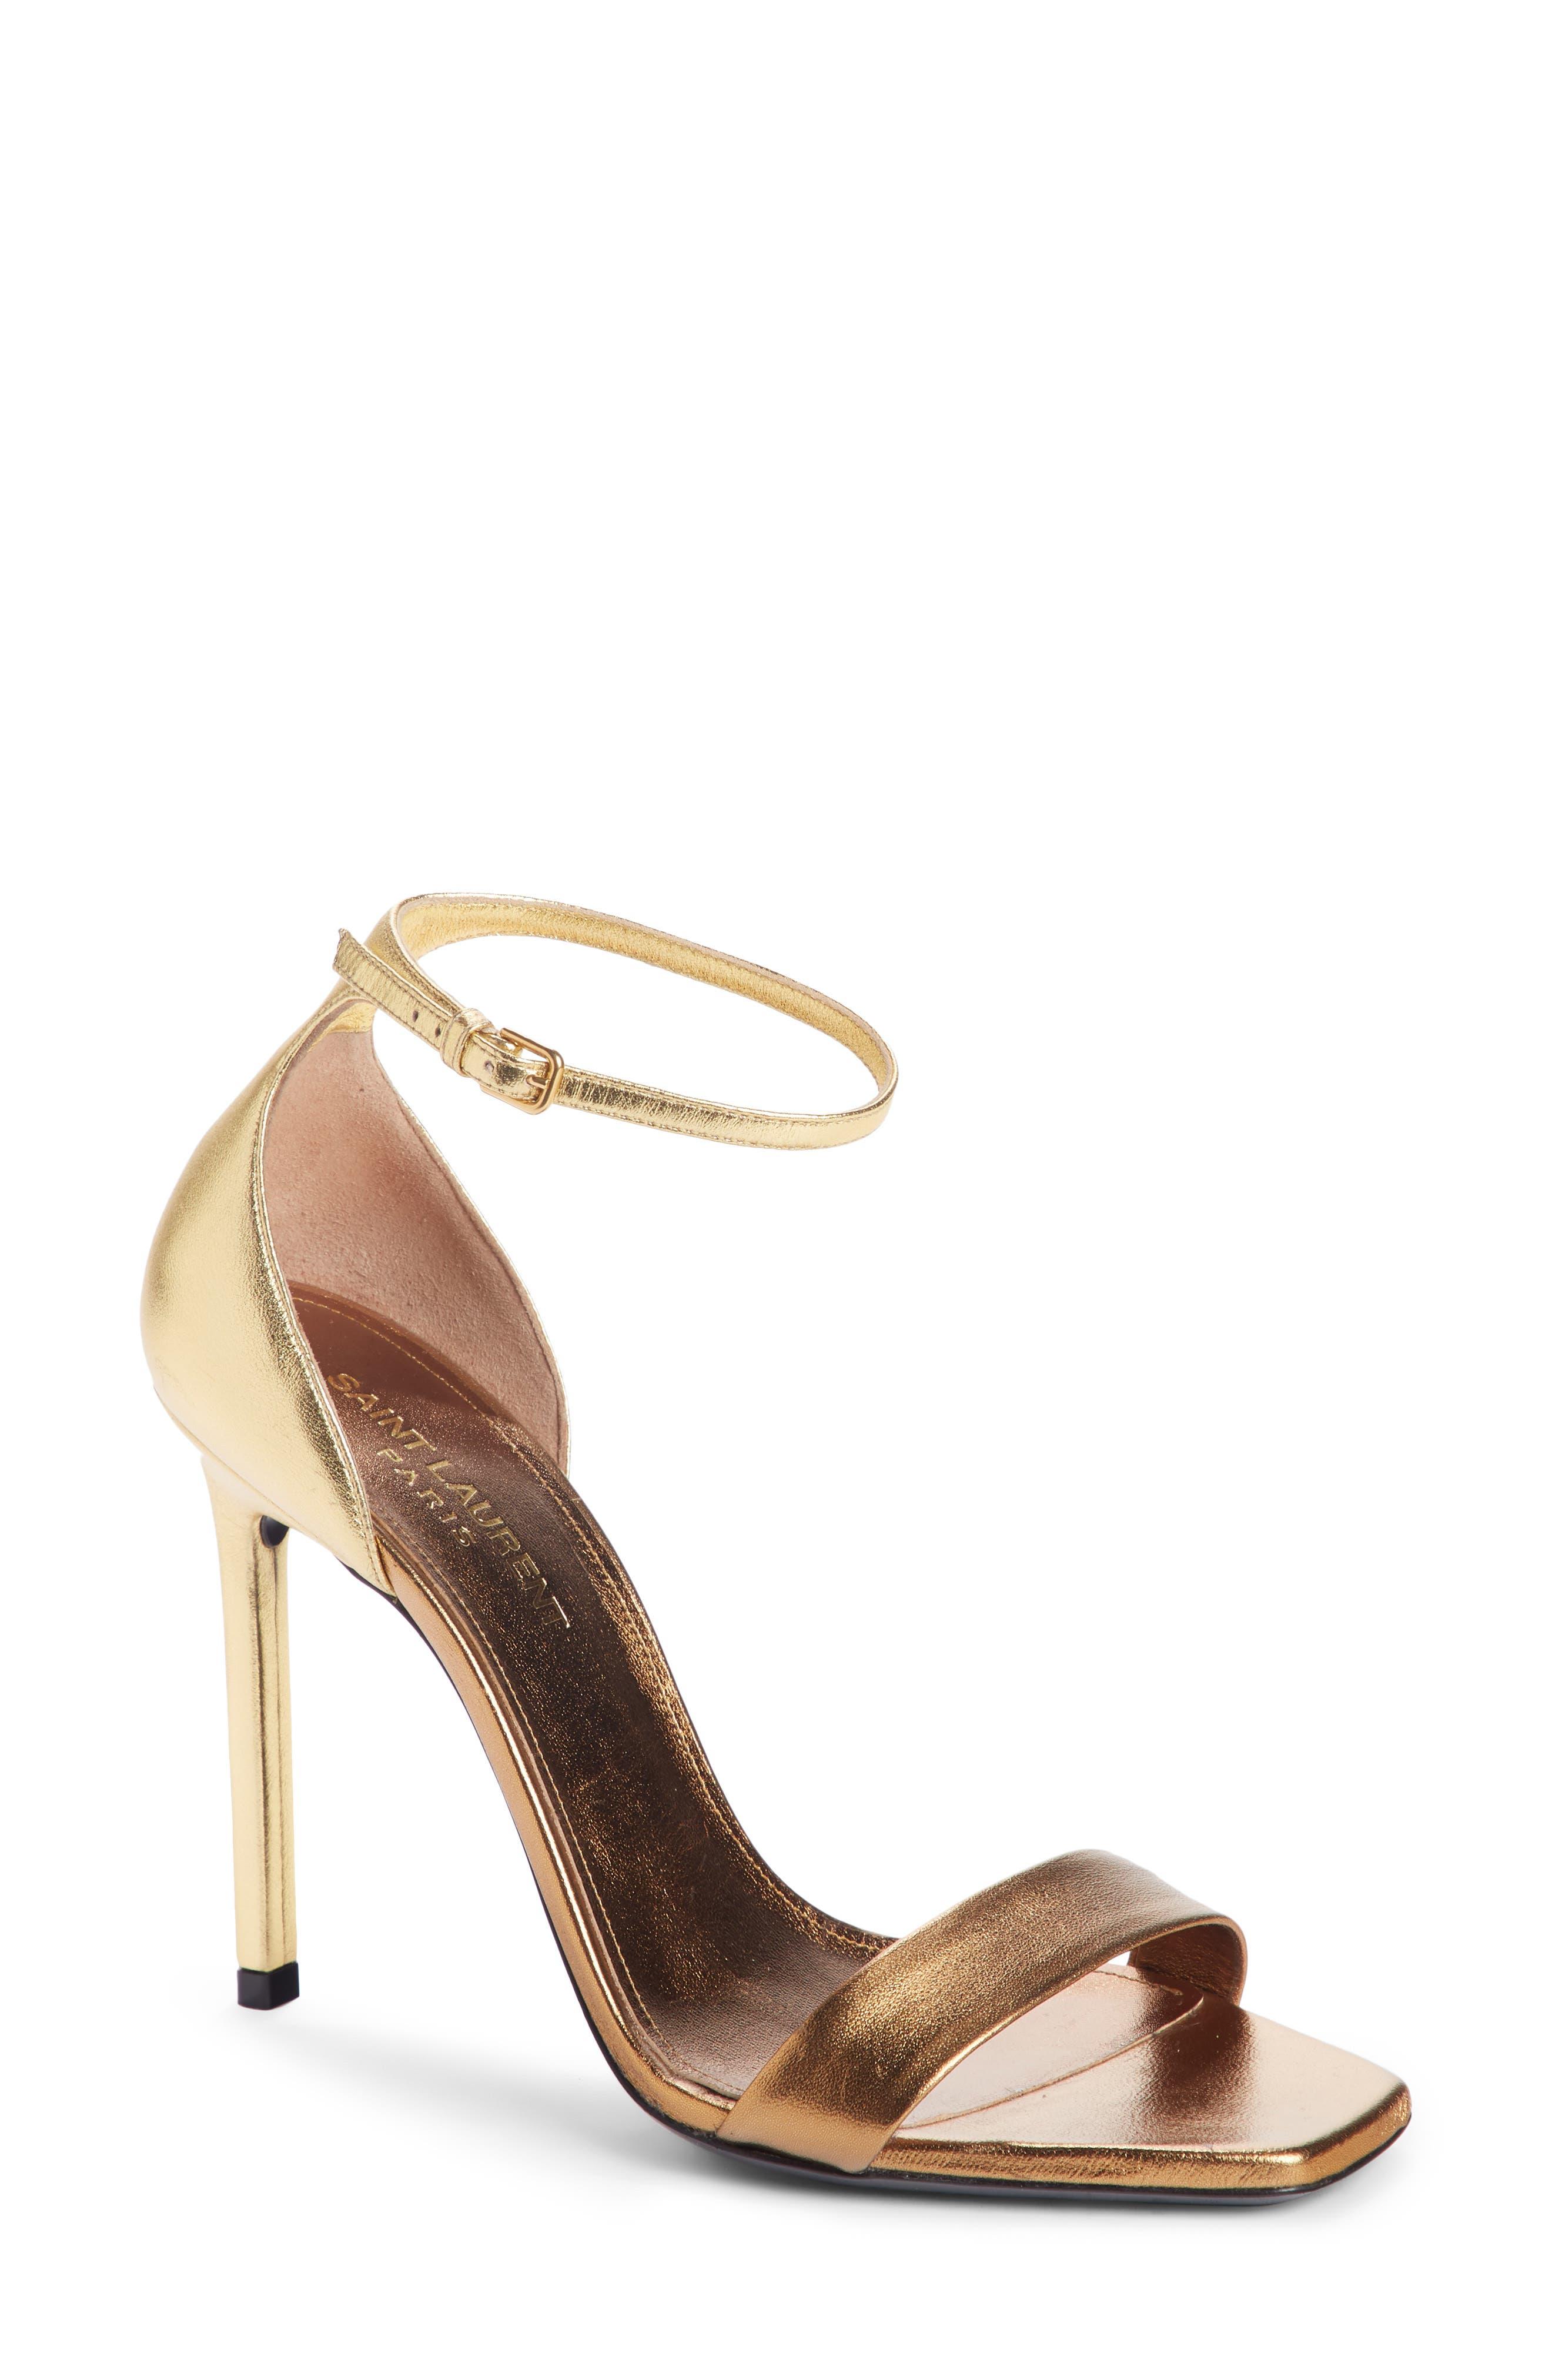 Amber Ankle Strap Sandal,                             Main thumbnail 1, color,                             BRONZE GOLD